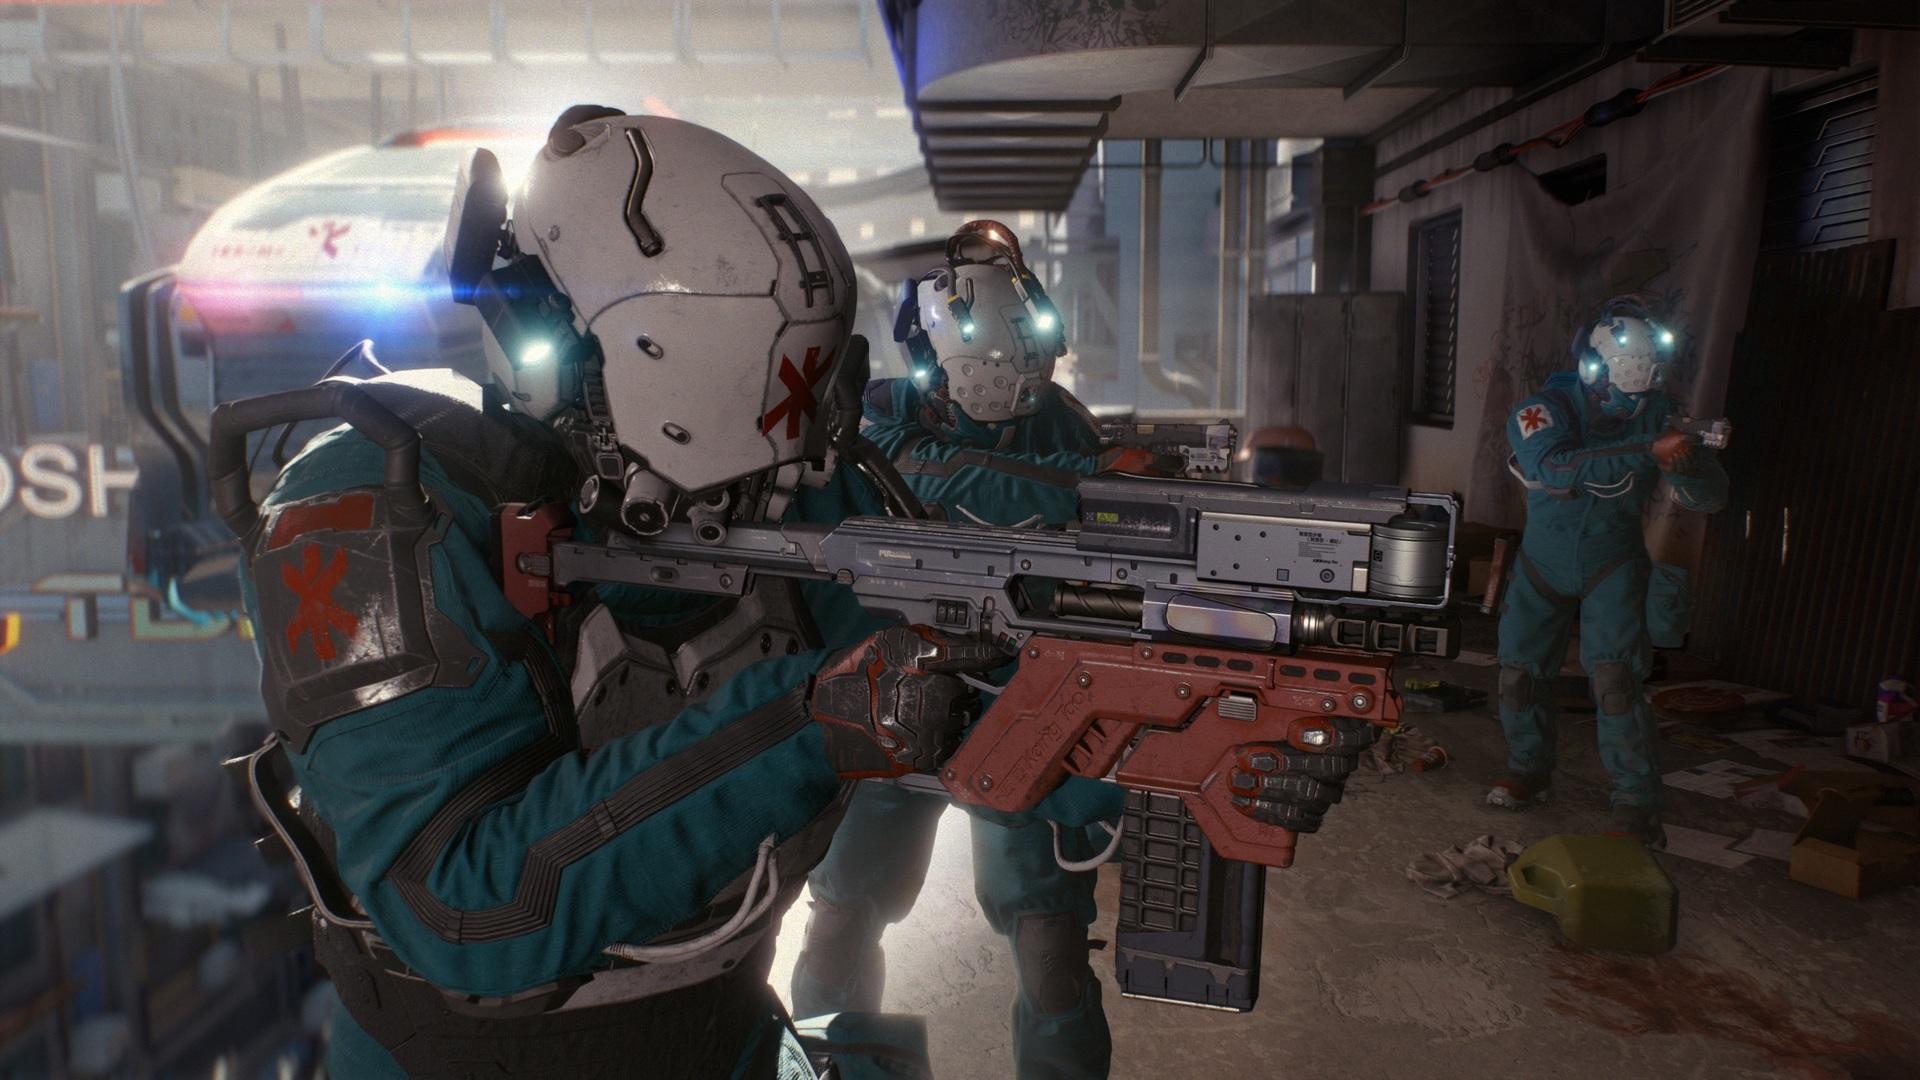 Cyberpunk2077_Shock_to_save_shoot_to_kill_RGB